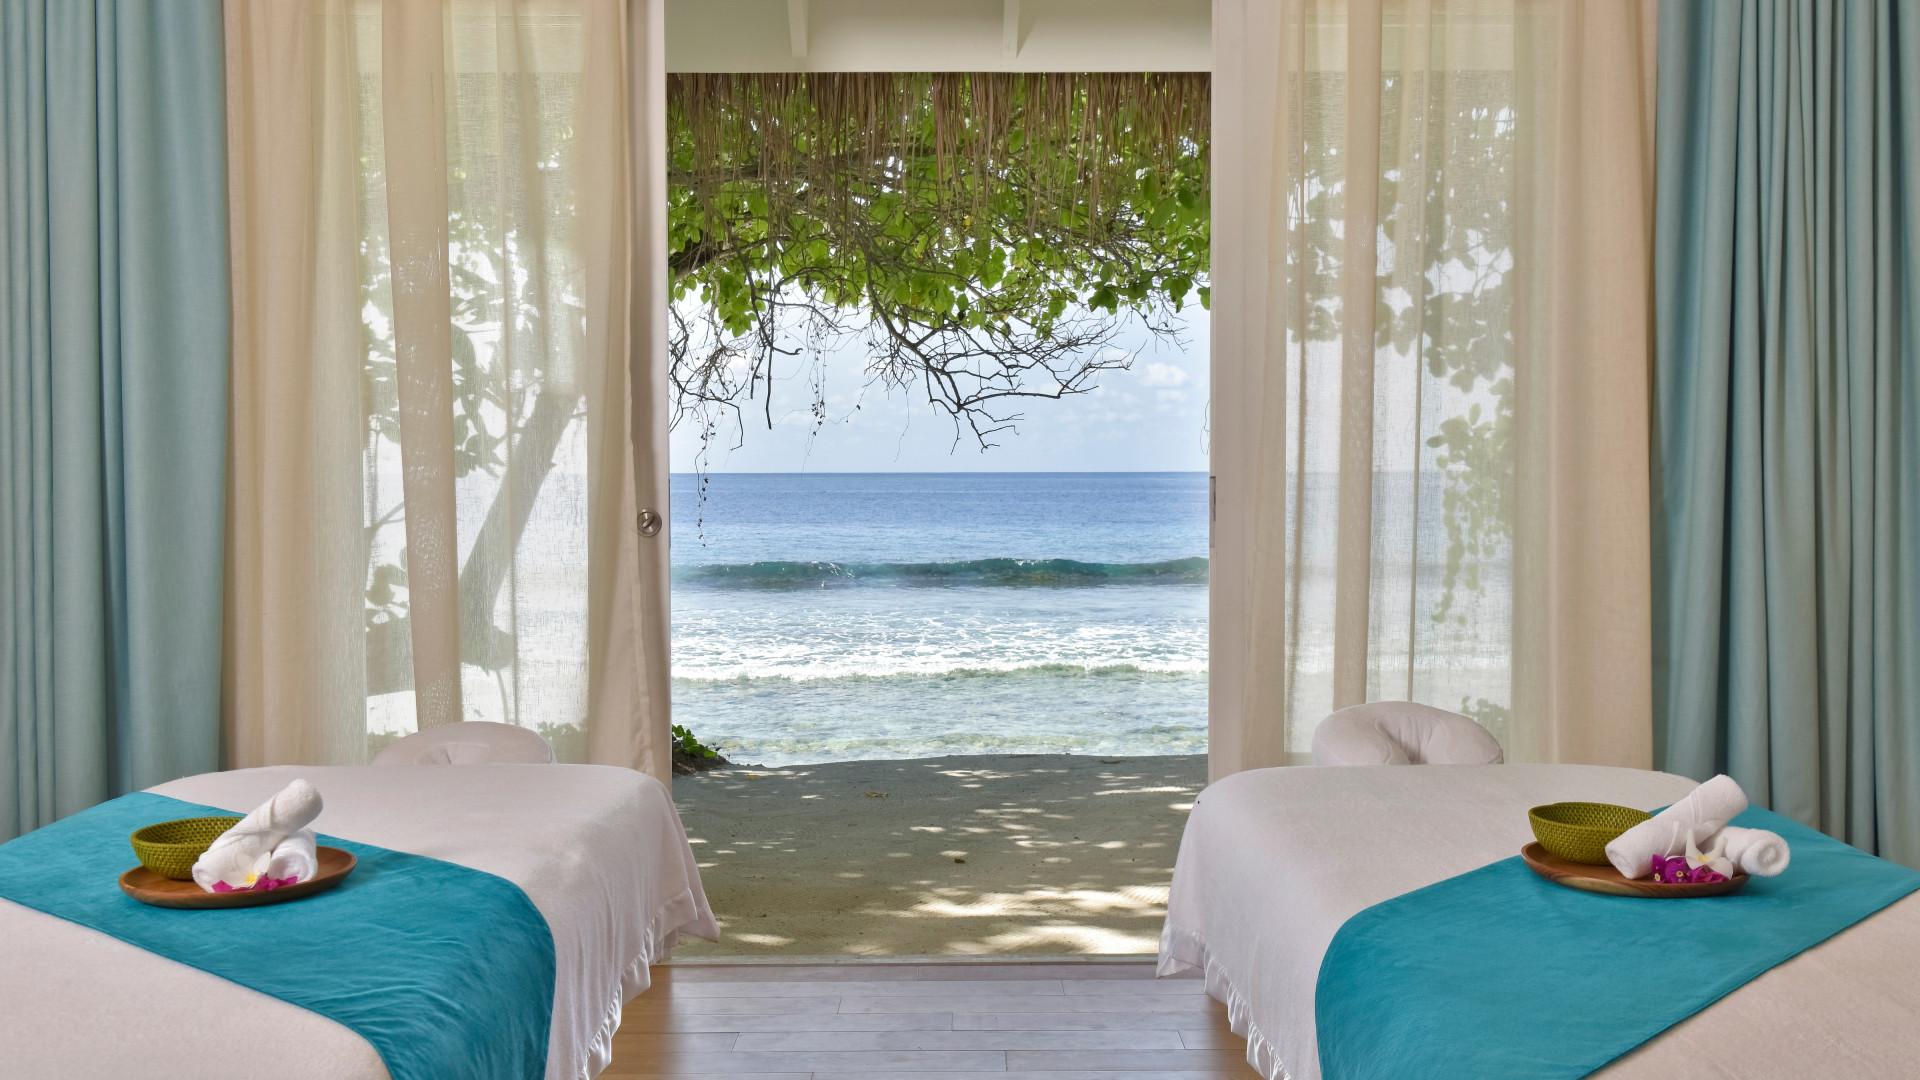 The esKape spa at Kandima Maldives